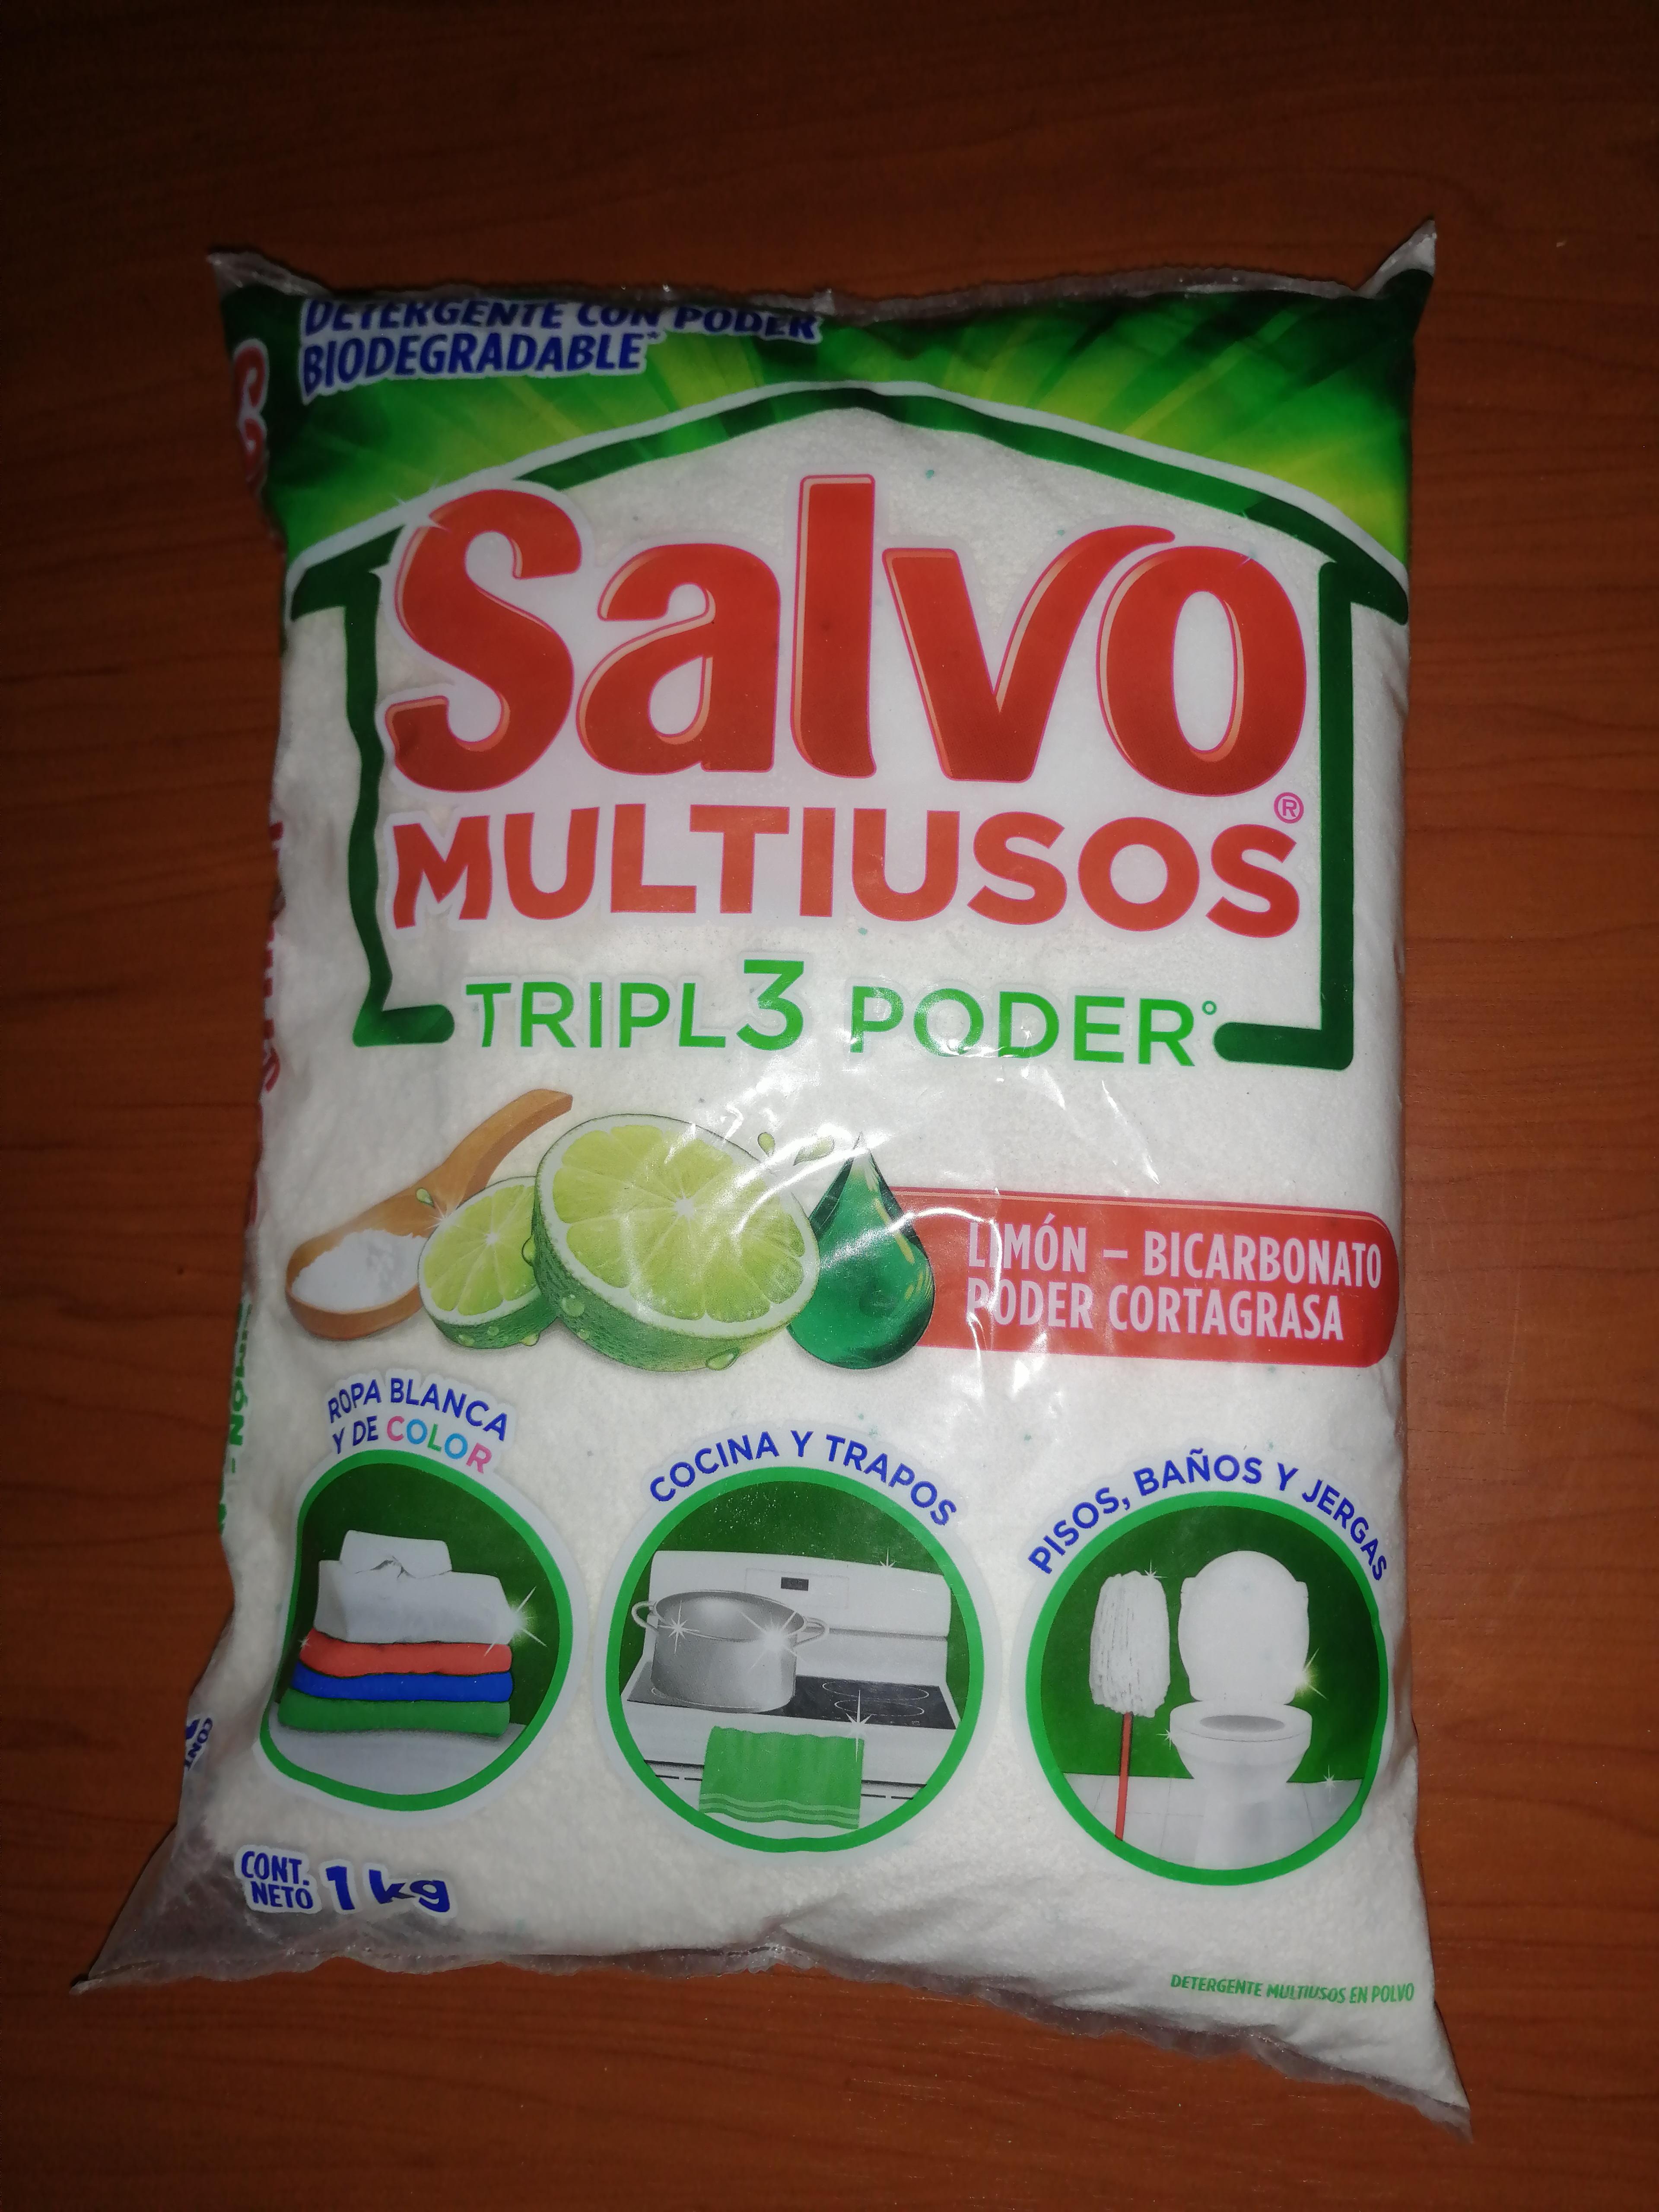 Walmart Reforma Puebla..., Jabón en polvo Salvo